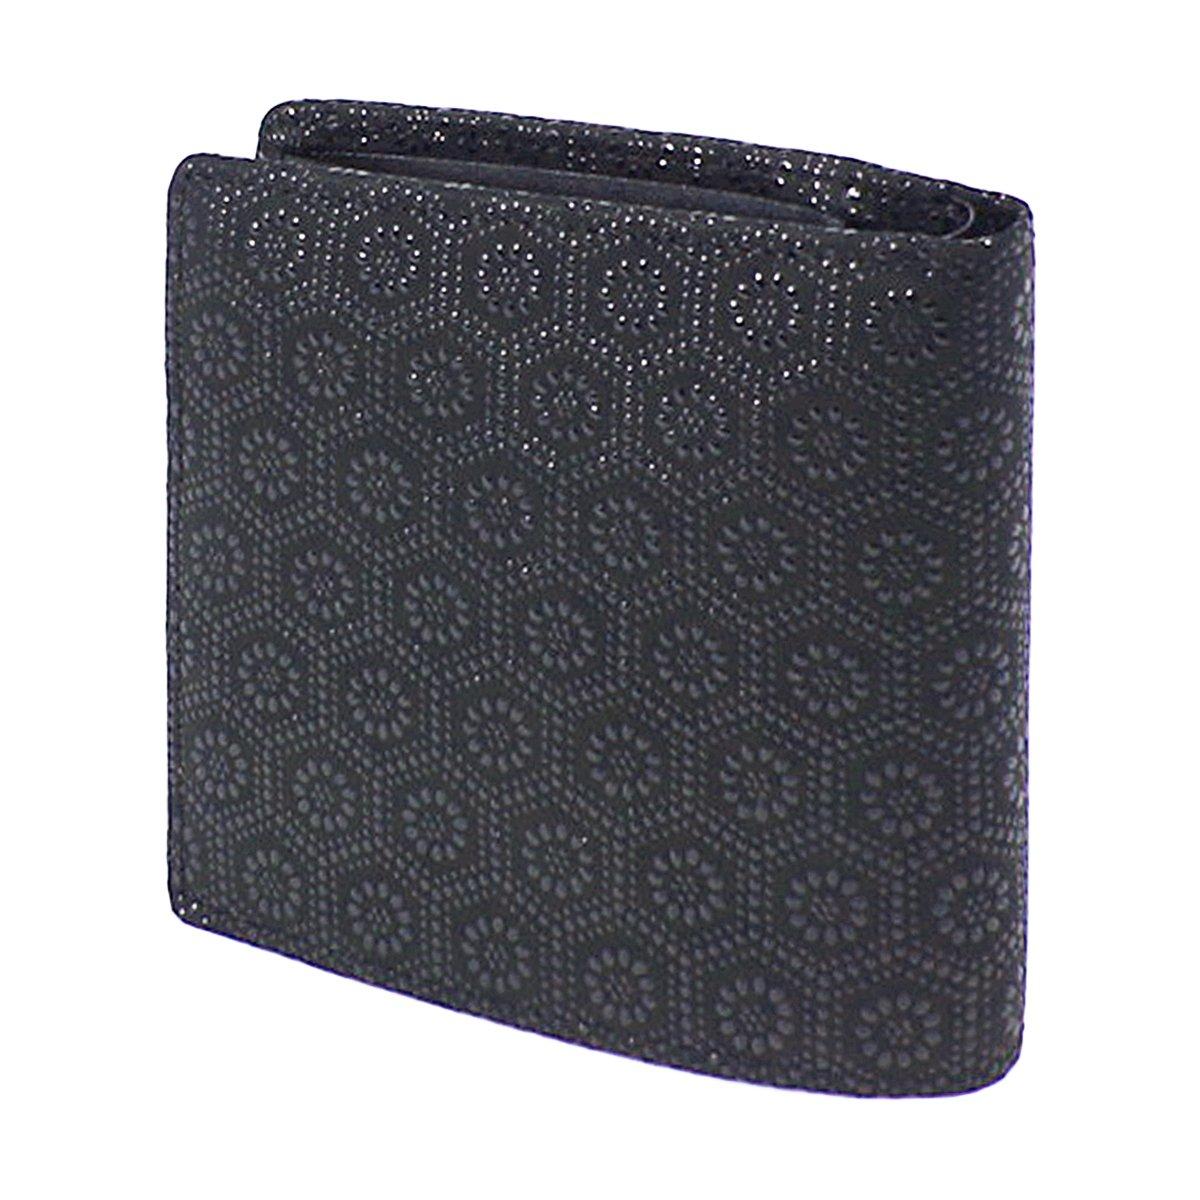 INDEN-YA 印傳屋 印伝 財布 二つ折り財布 メンズ 男性用 黒×黒 亀甲 2008-01-003 B01HHHWM7W